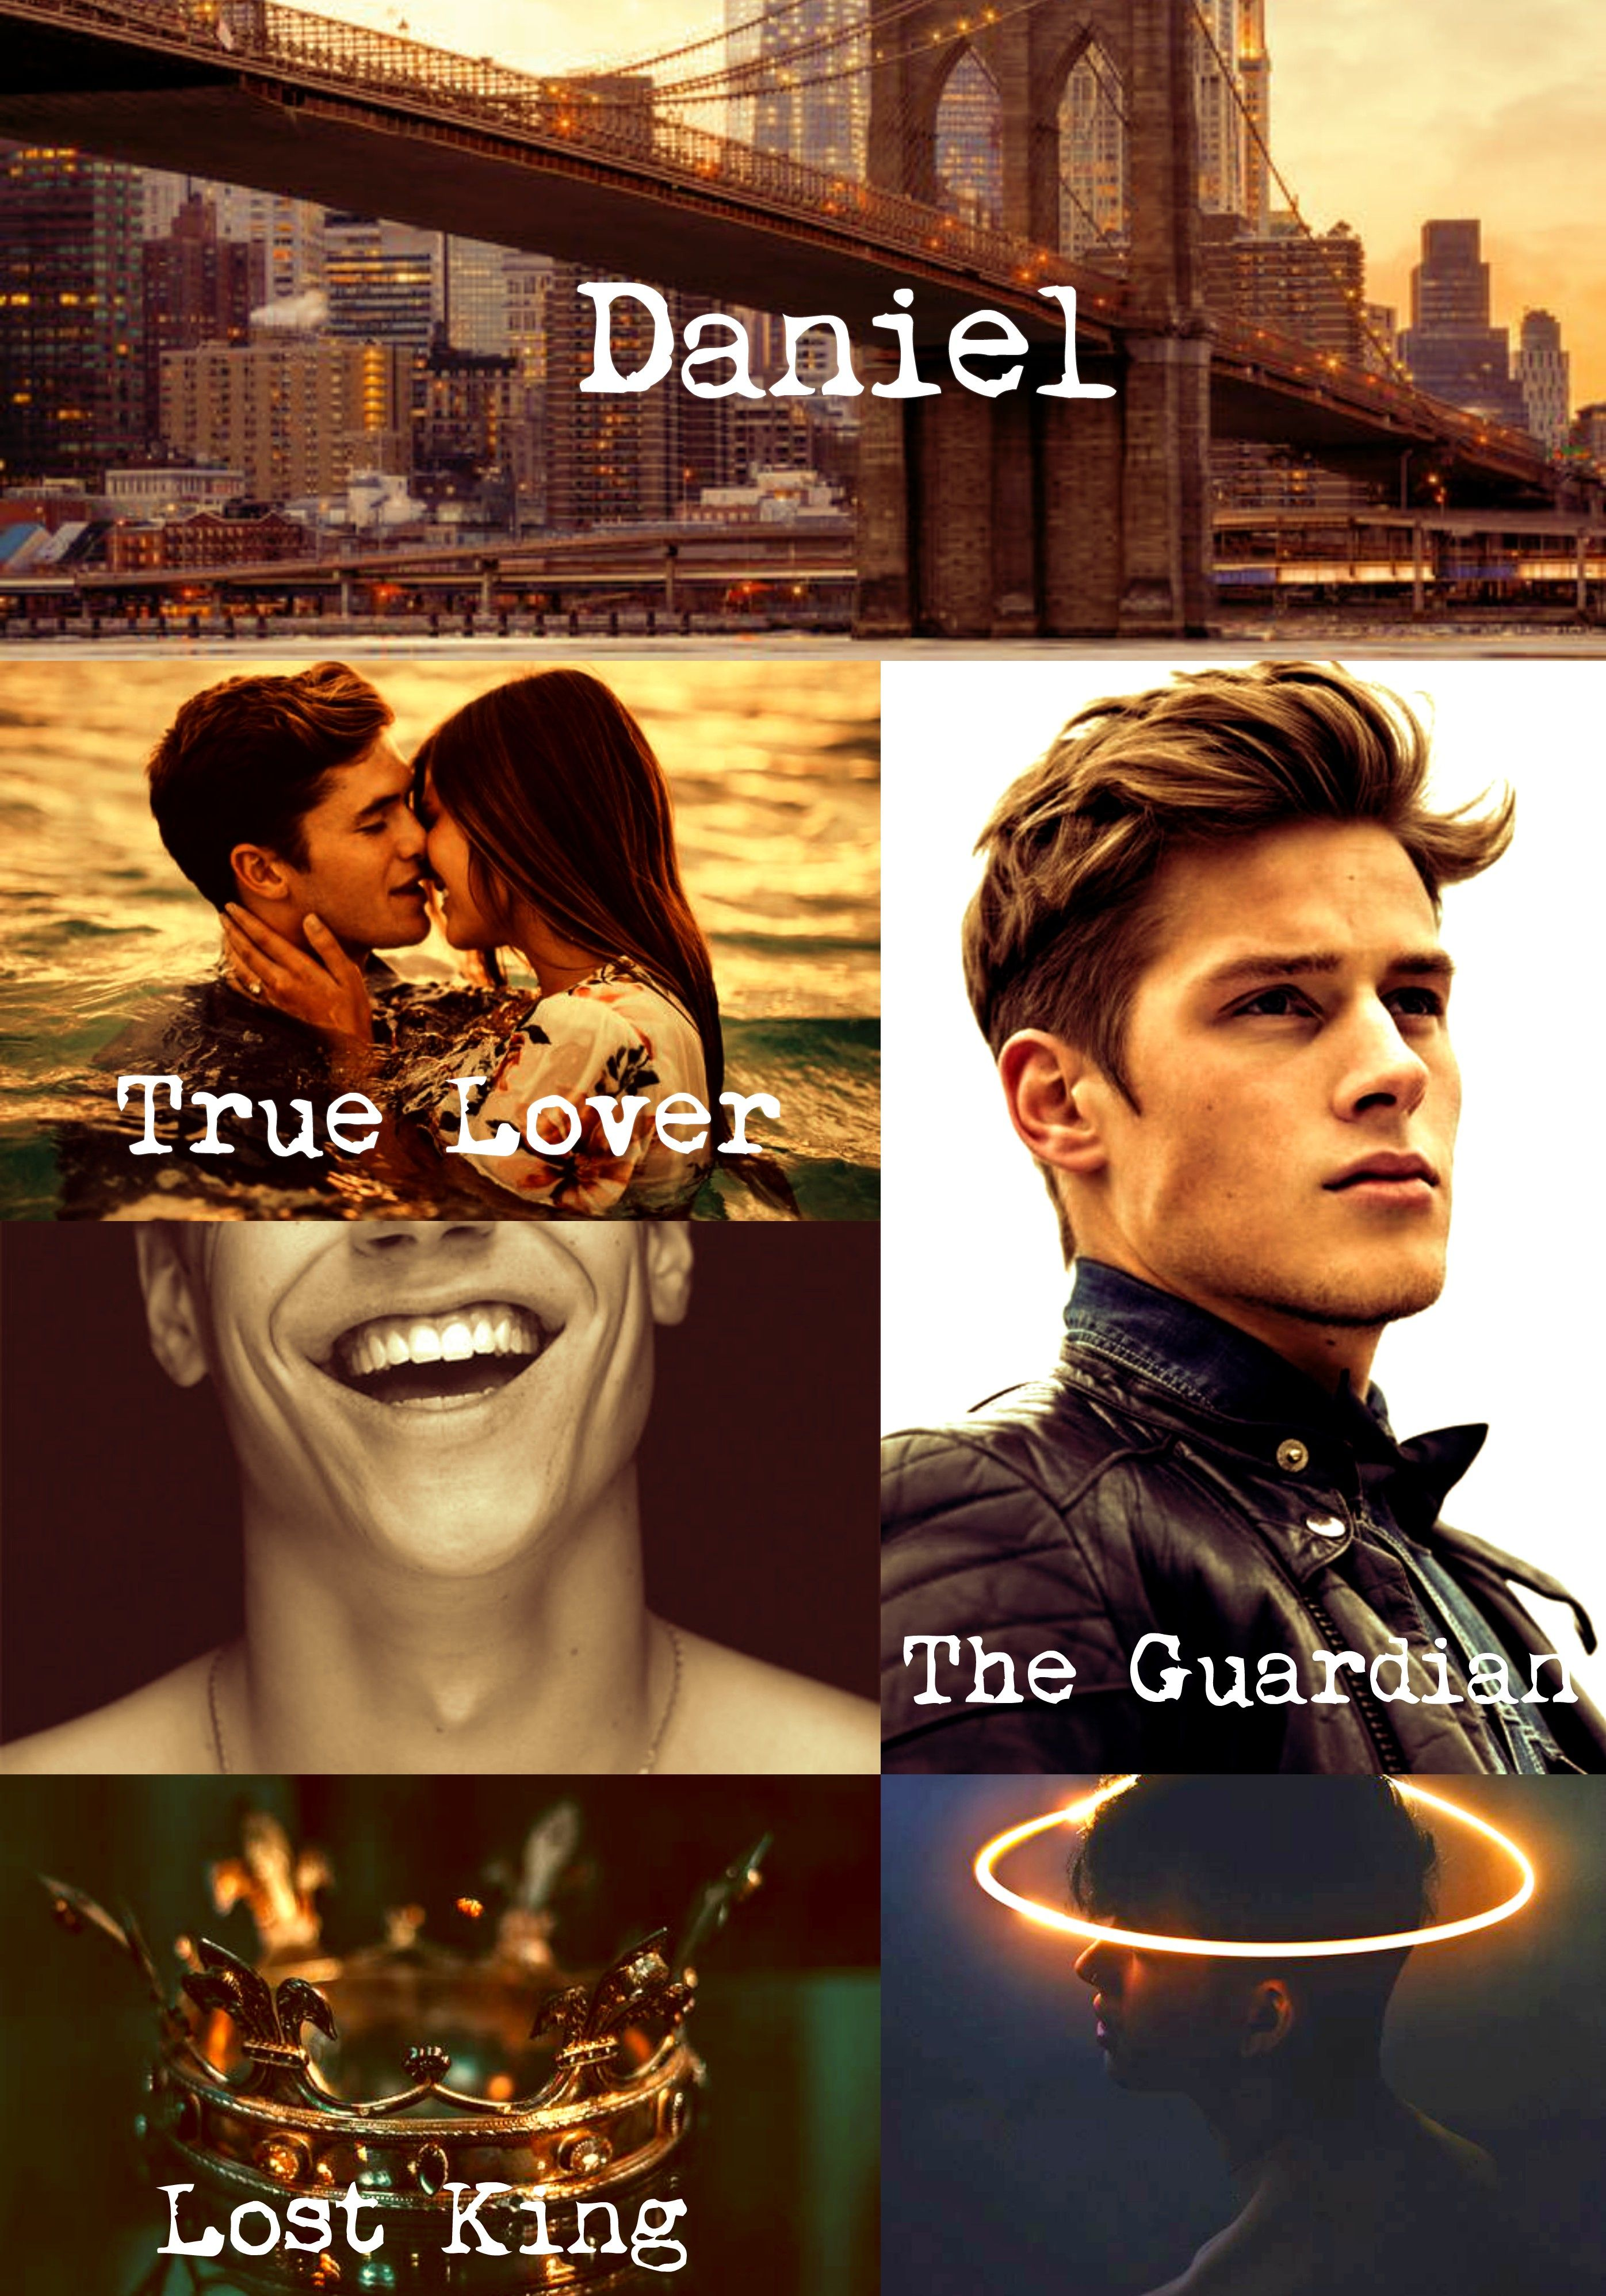 DANIEL!!! how is #teamDaniel???  #novels #wattpad #malecharacters #light #good #cry #read #book #saga #destino #temible #hibrida #extraterrestres